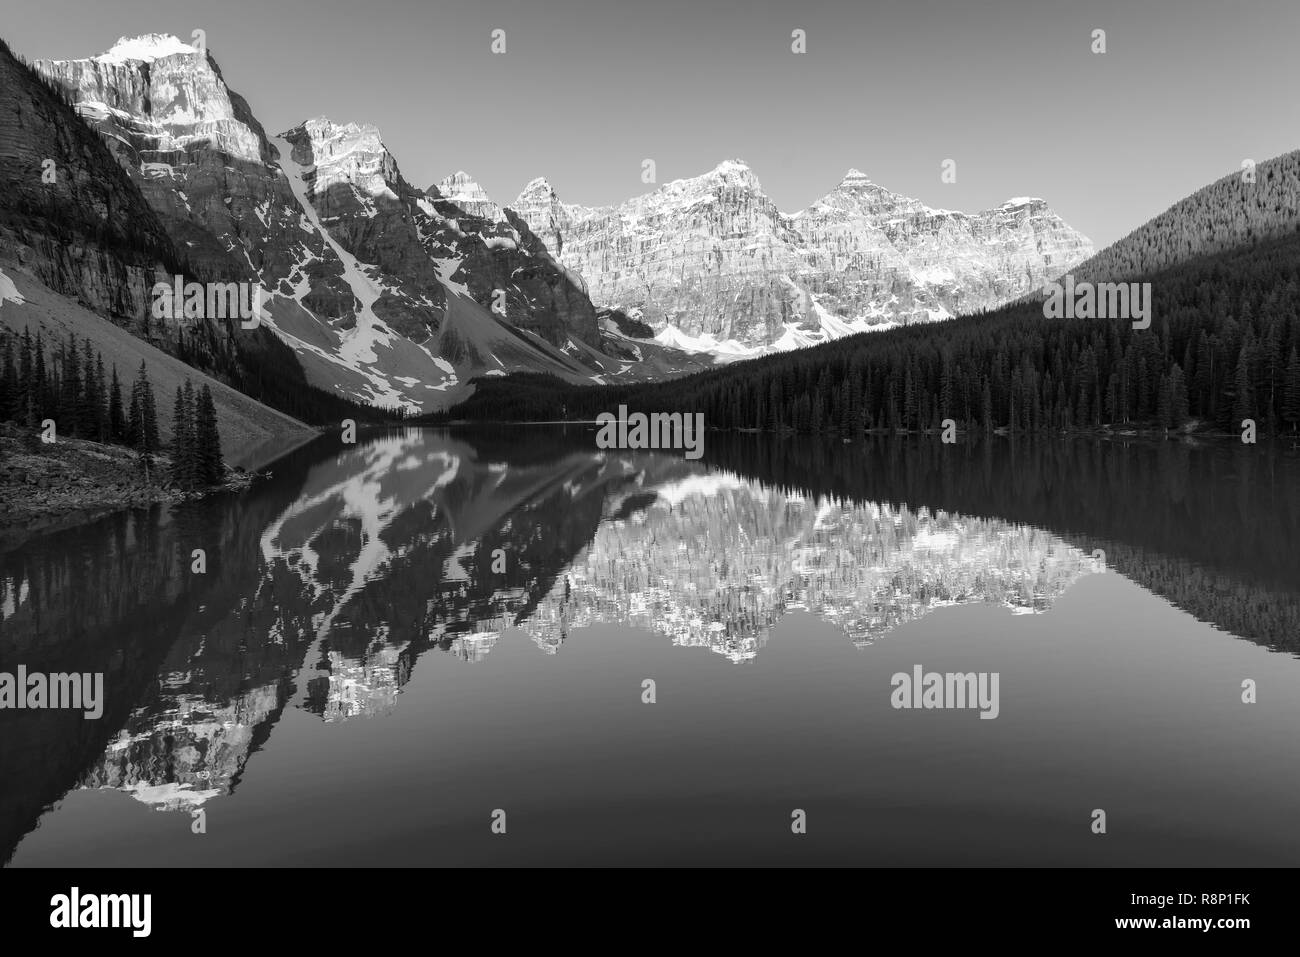 Sunrise at Moraine lake, Canada. Black & White. Stock Photo